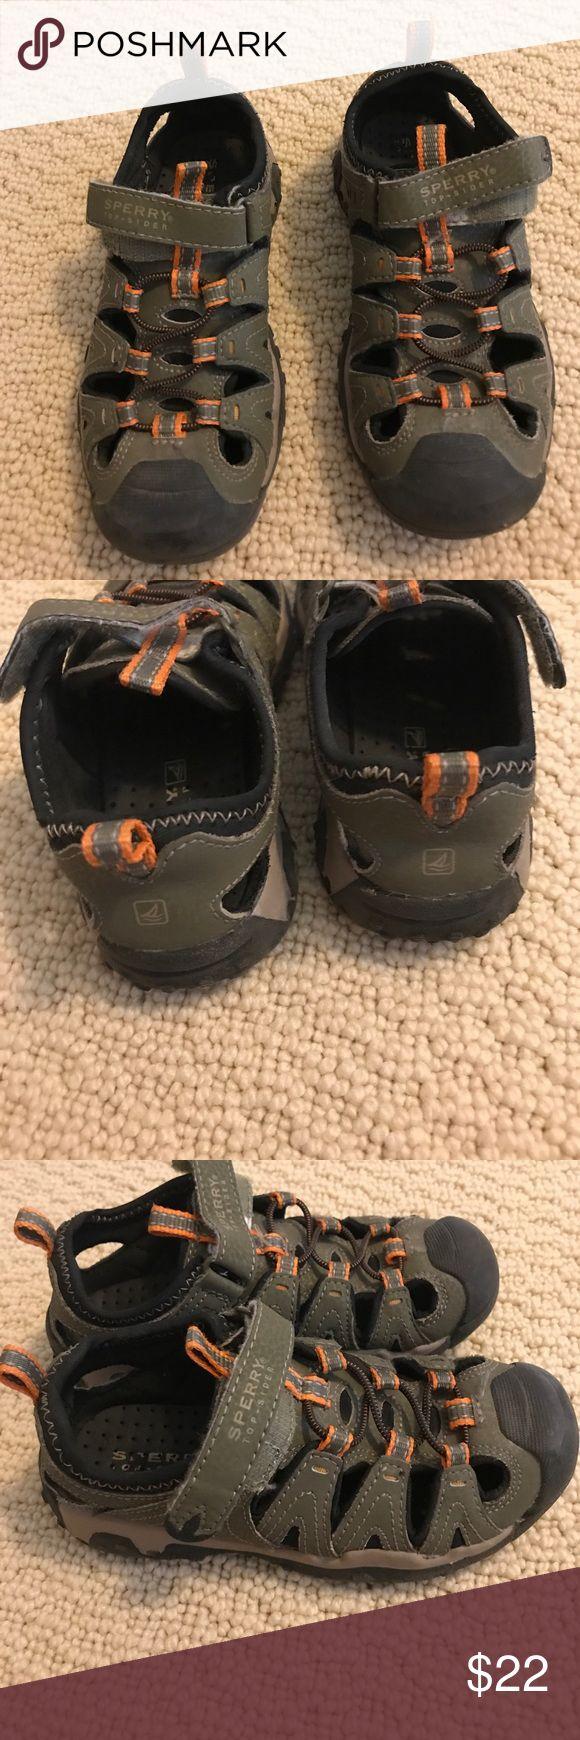 Boys Sperry Wet Tech Sandals - 11M Boys Sperry Wet Tech Sandals - 11M Excellent Condition. Great camp shoes! Sperry Top-Sider Shoes Sandals & Flip Flops